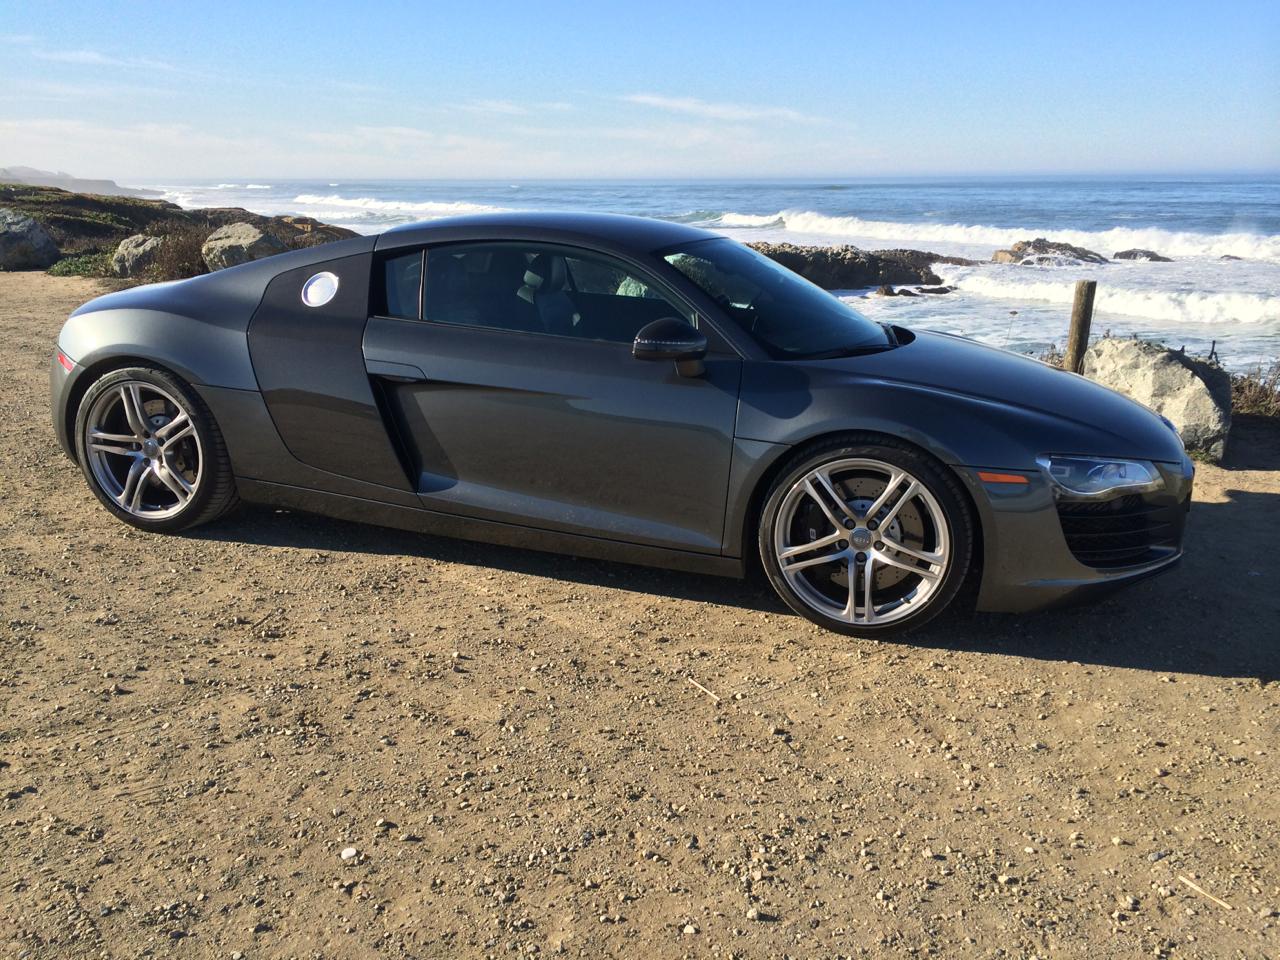 Sfo Hertz Car Rental Return Address